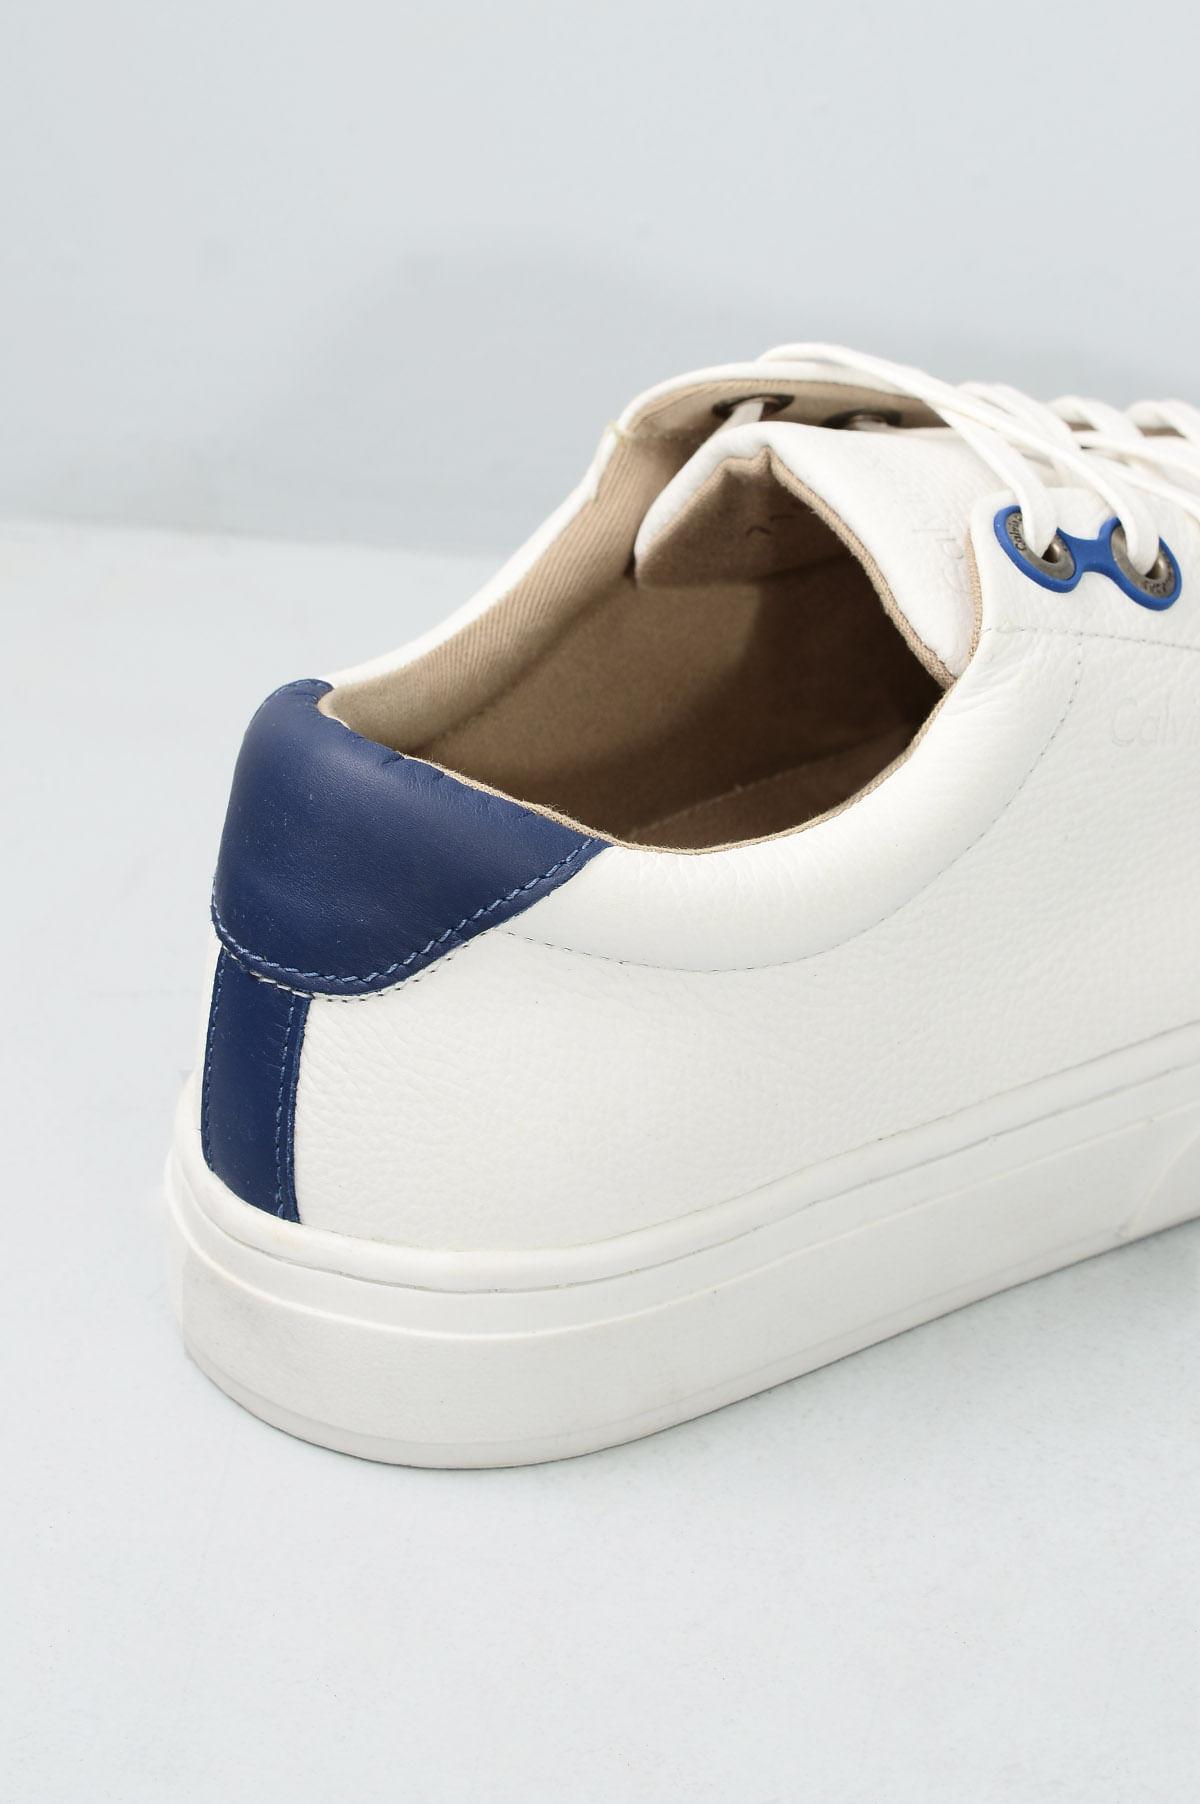 ff818d5cab5 Sapatênis Masculino Calvin Klein Sergio CR-BRANCO - Mundial Calçados